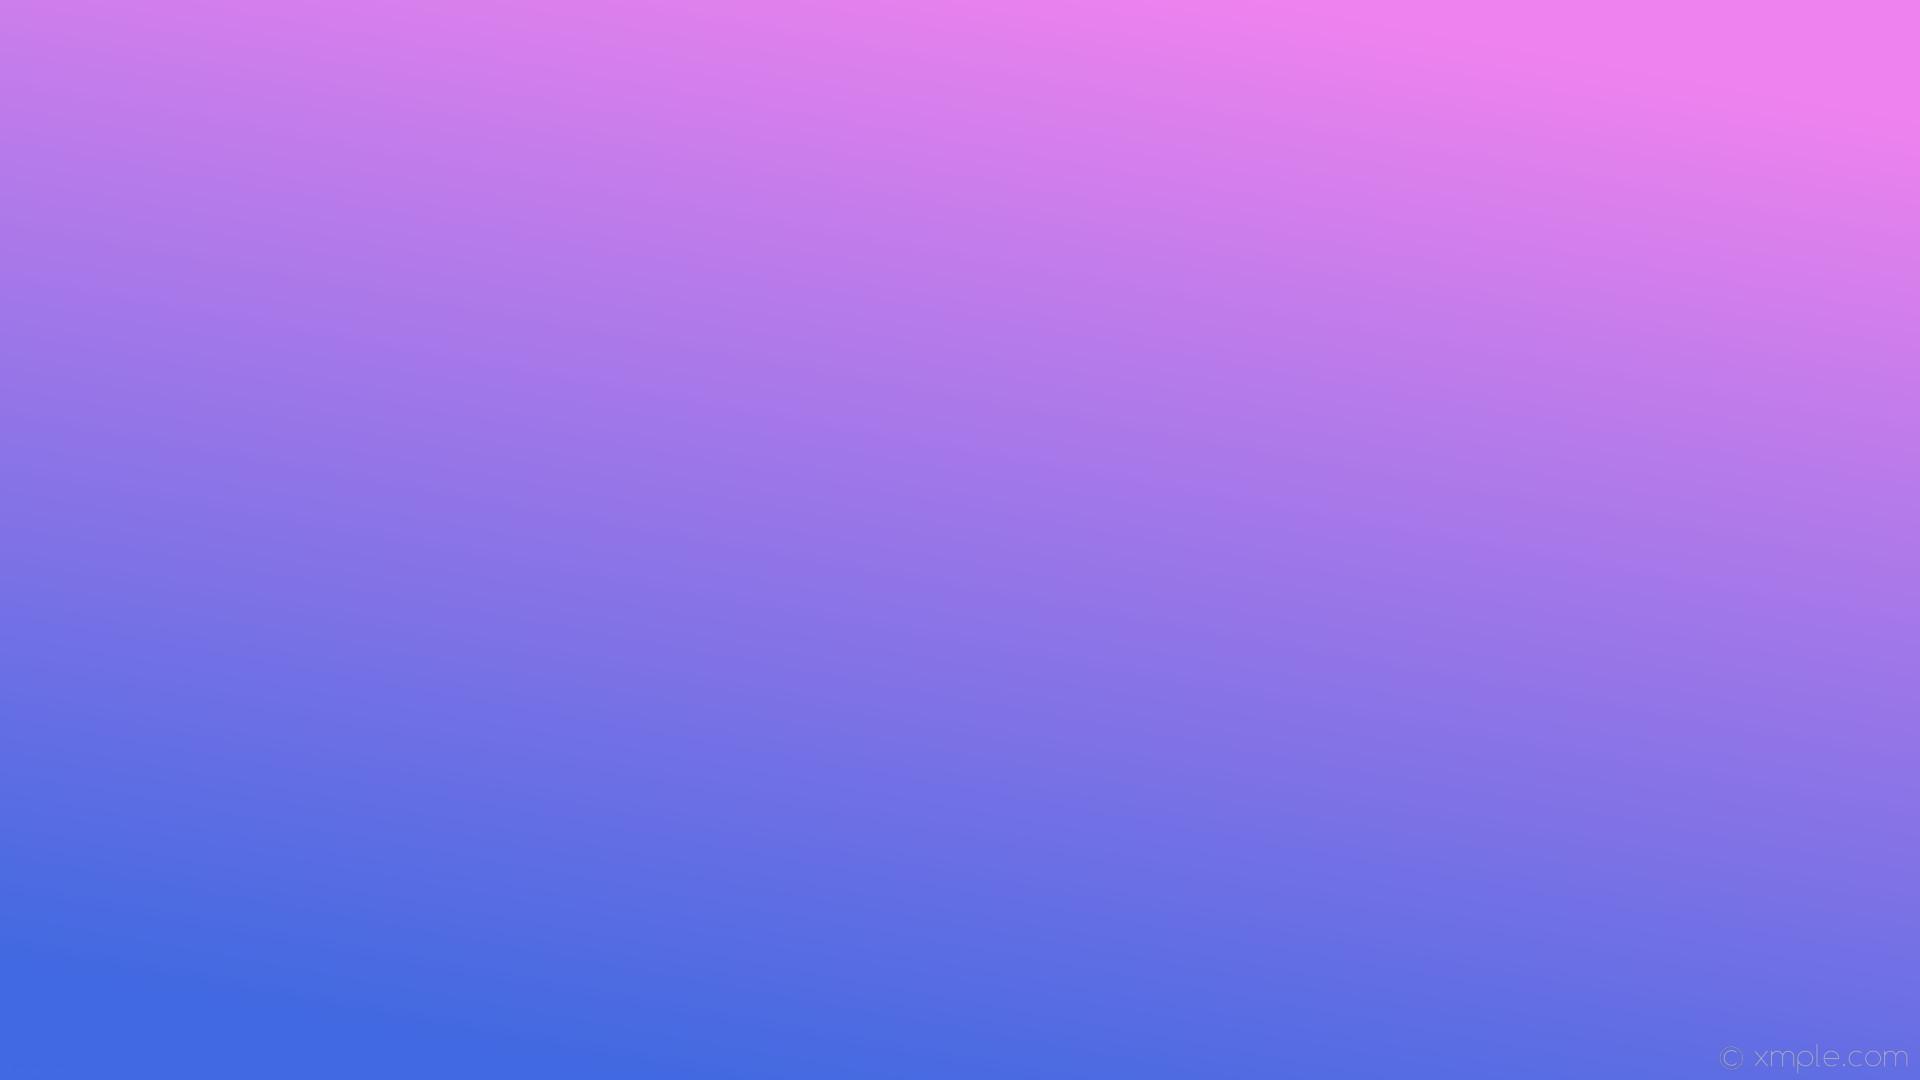 wallpaper purple linear blue gradient violet royal blue #ee82ee #4169e1 60°